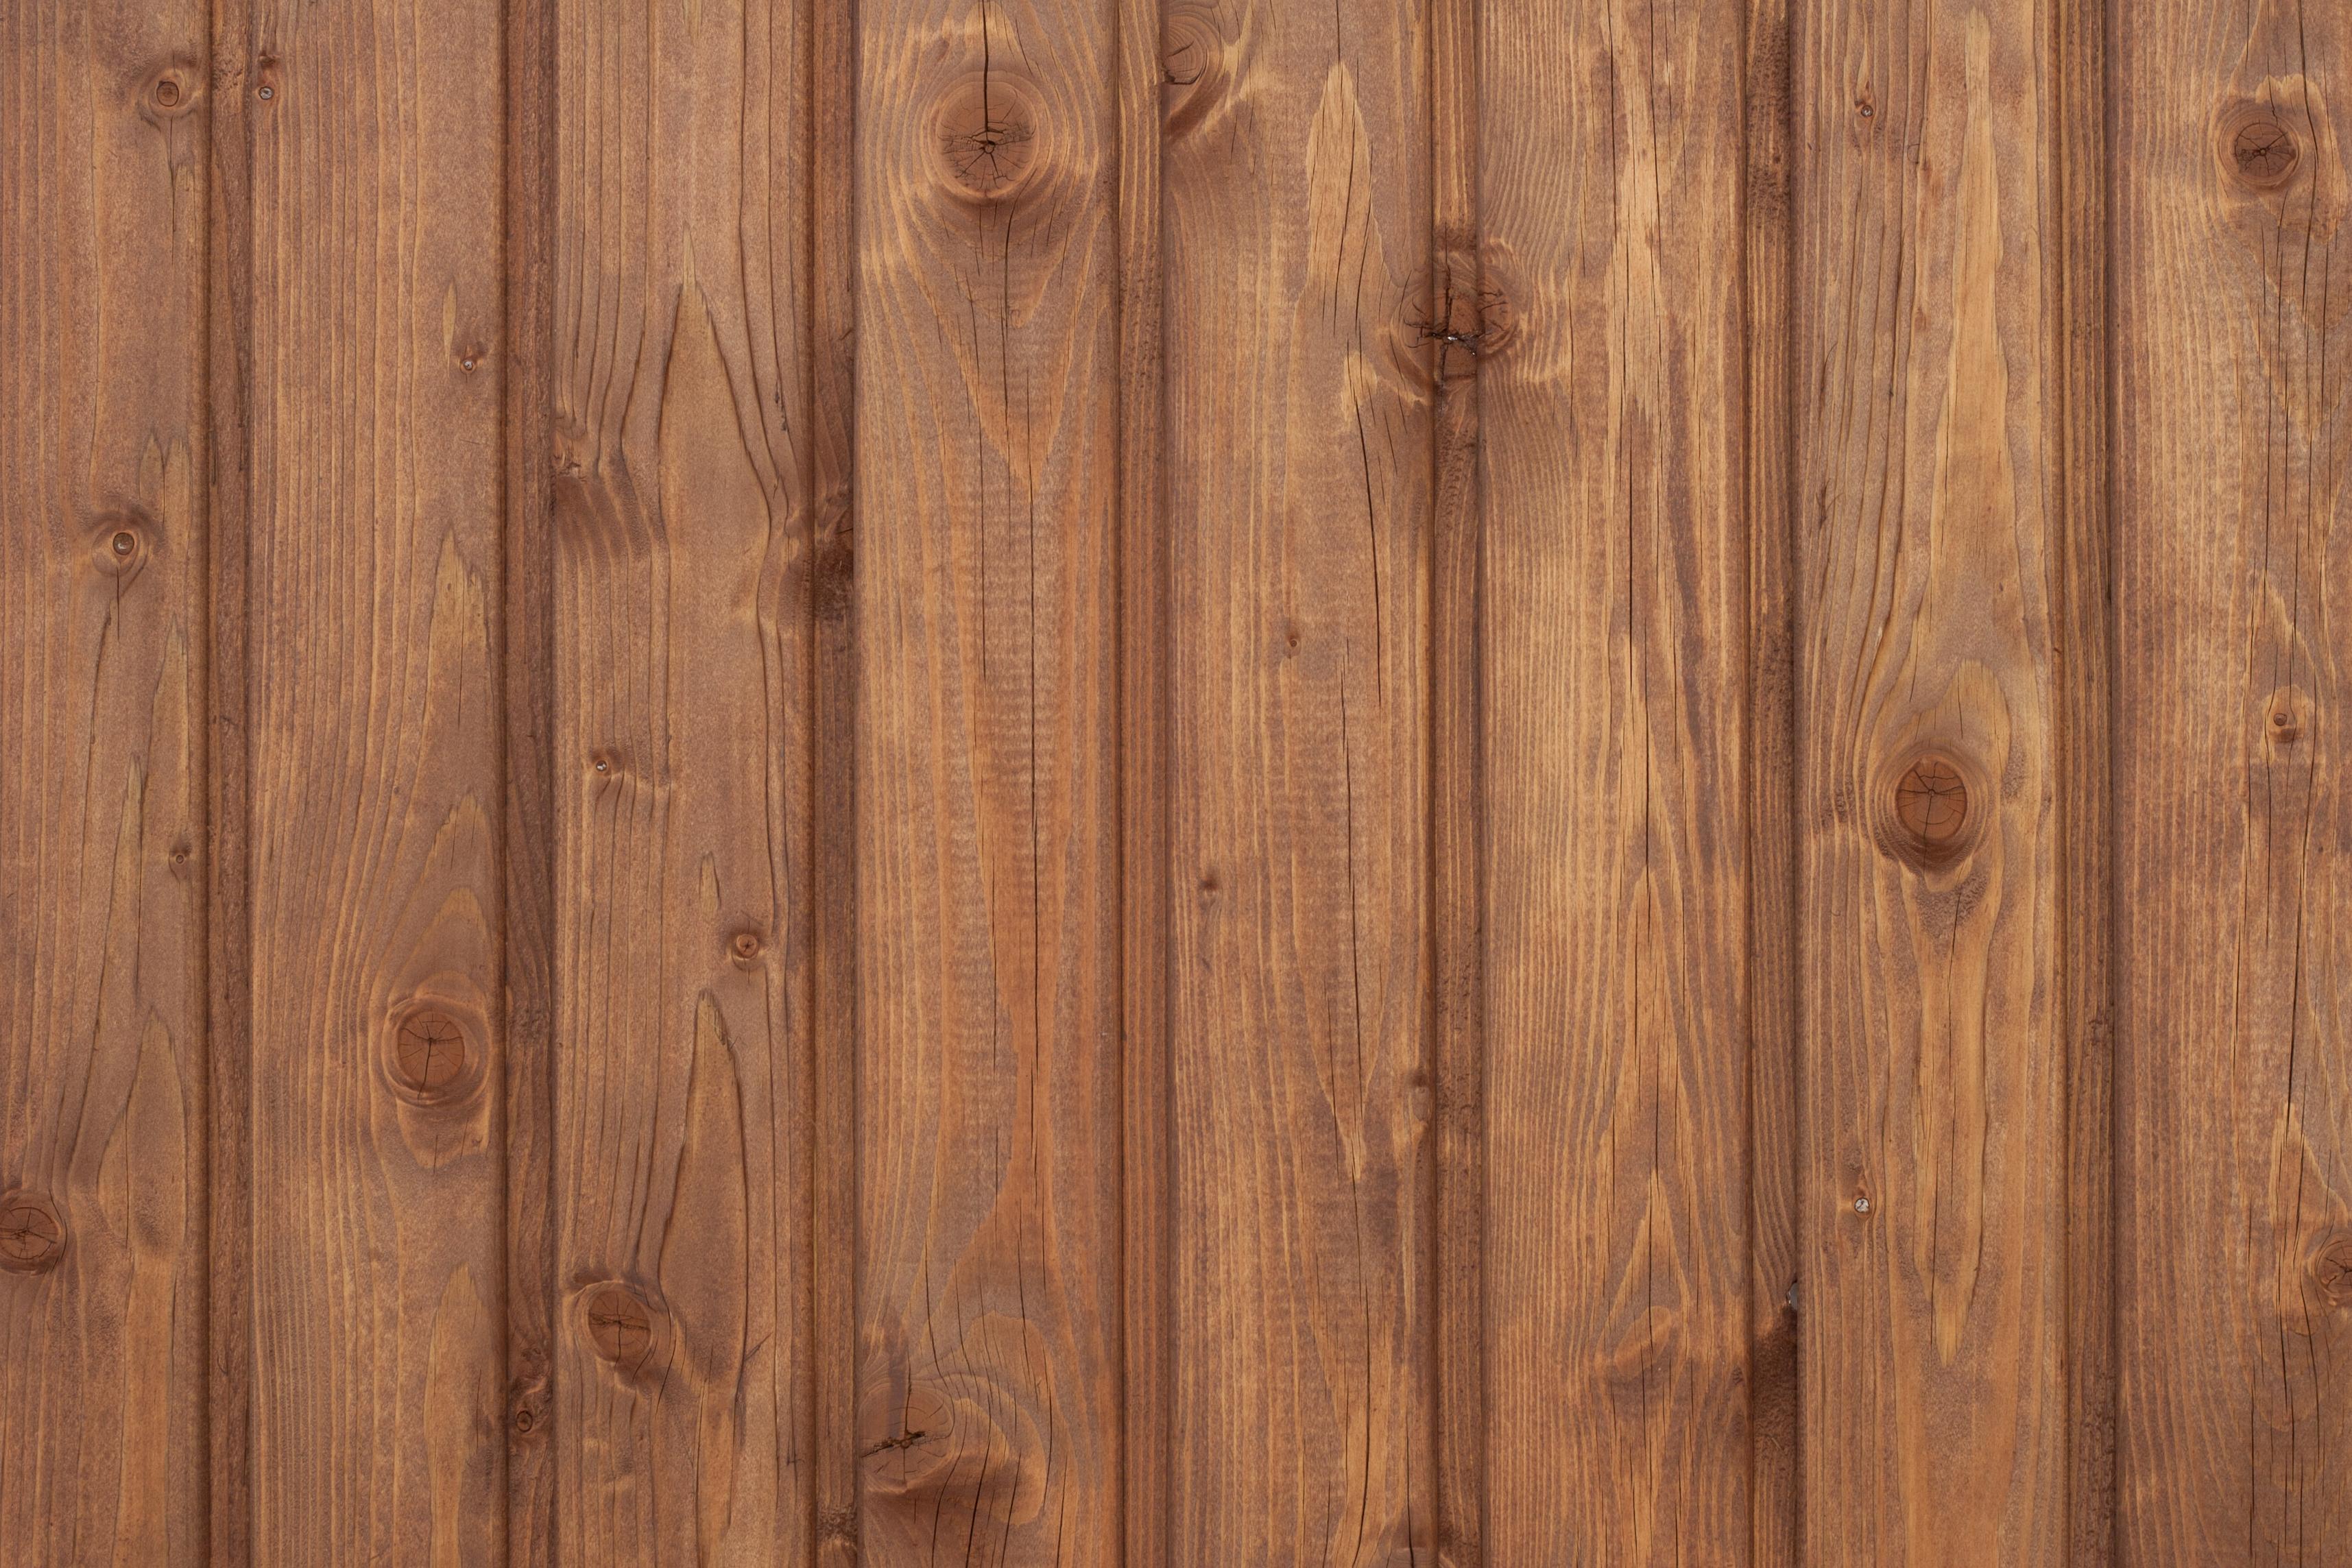 Wood panel texture photo